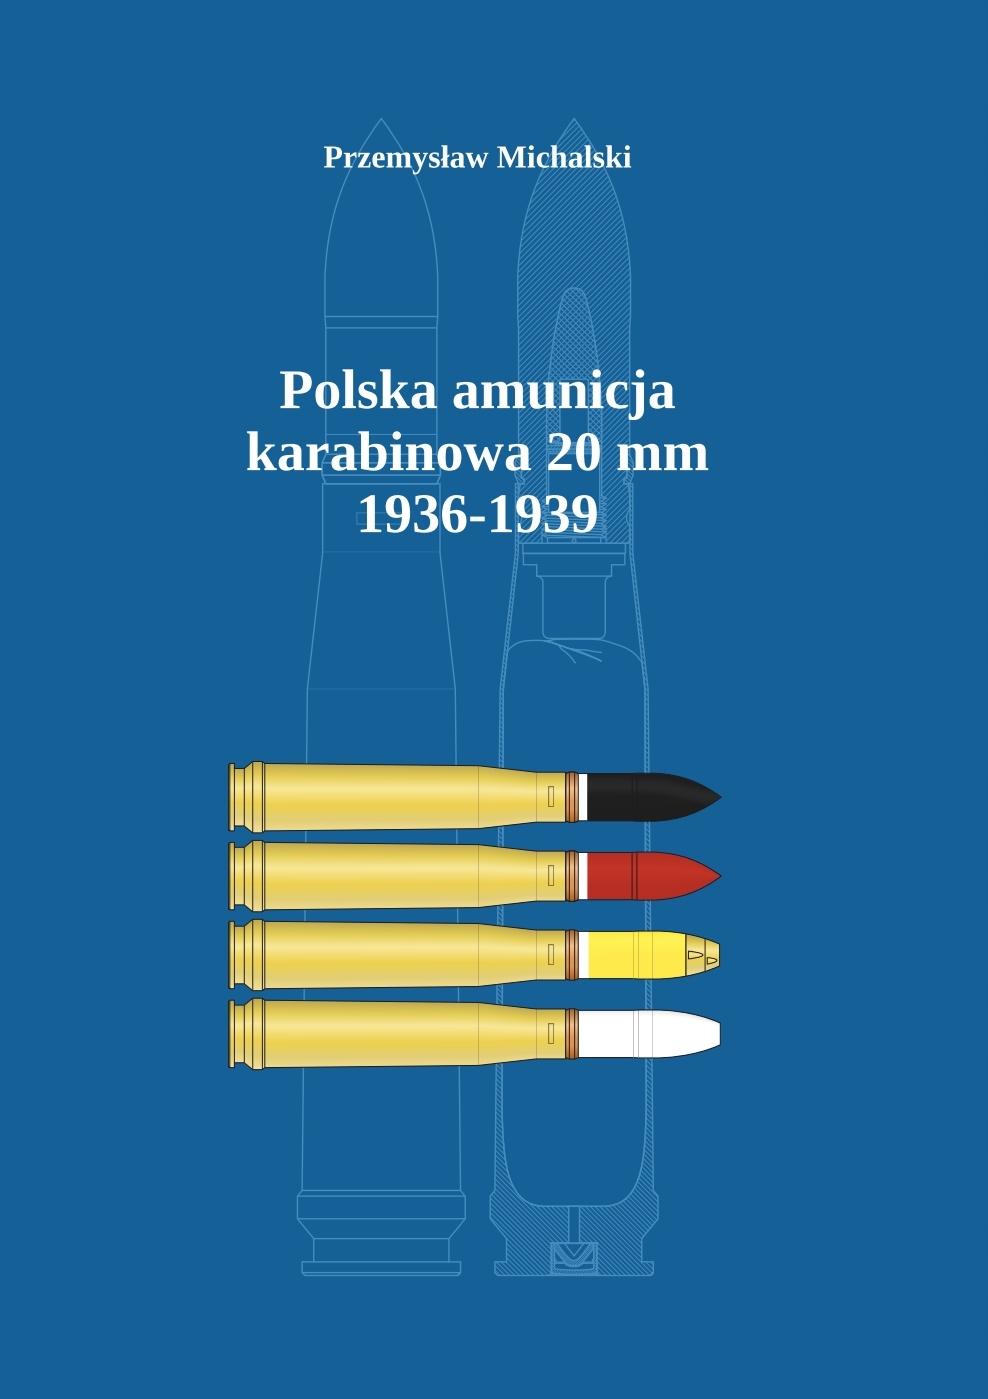 Polska amunicja karabinowa 20 mm 1936-1939